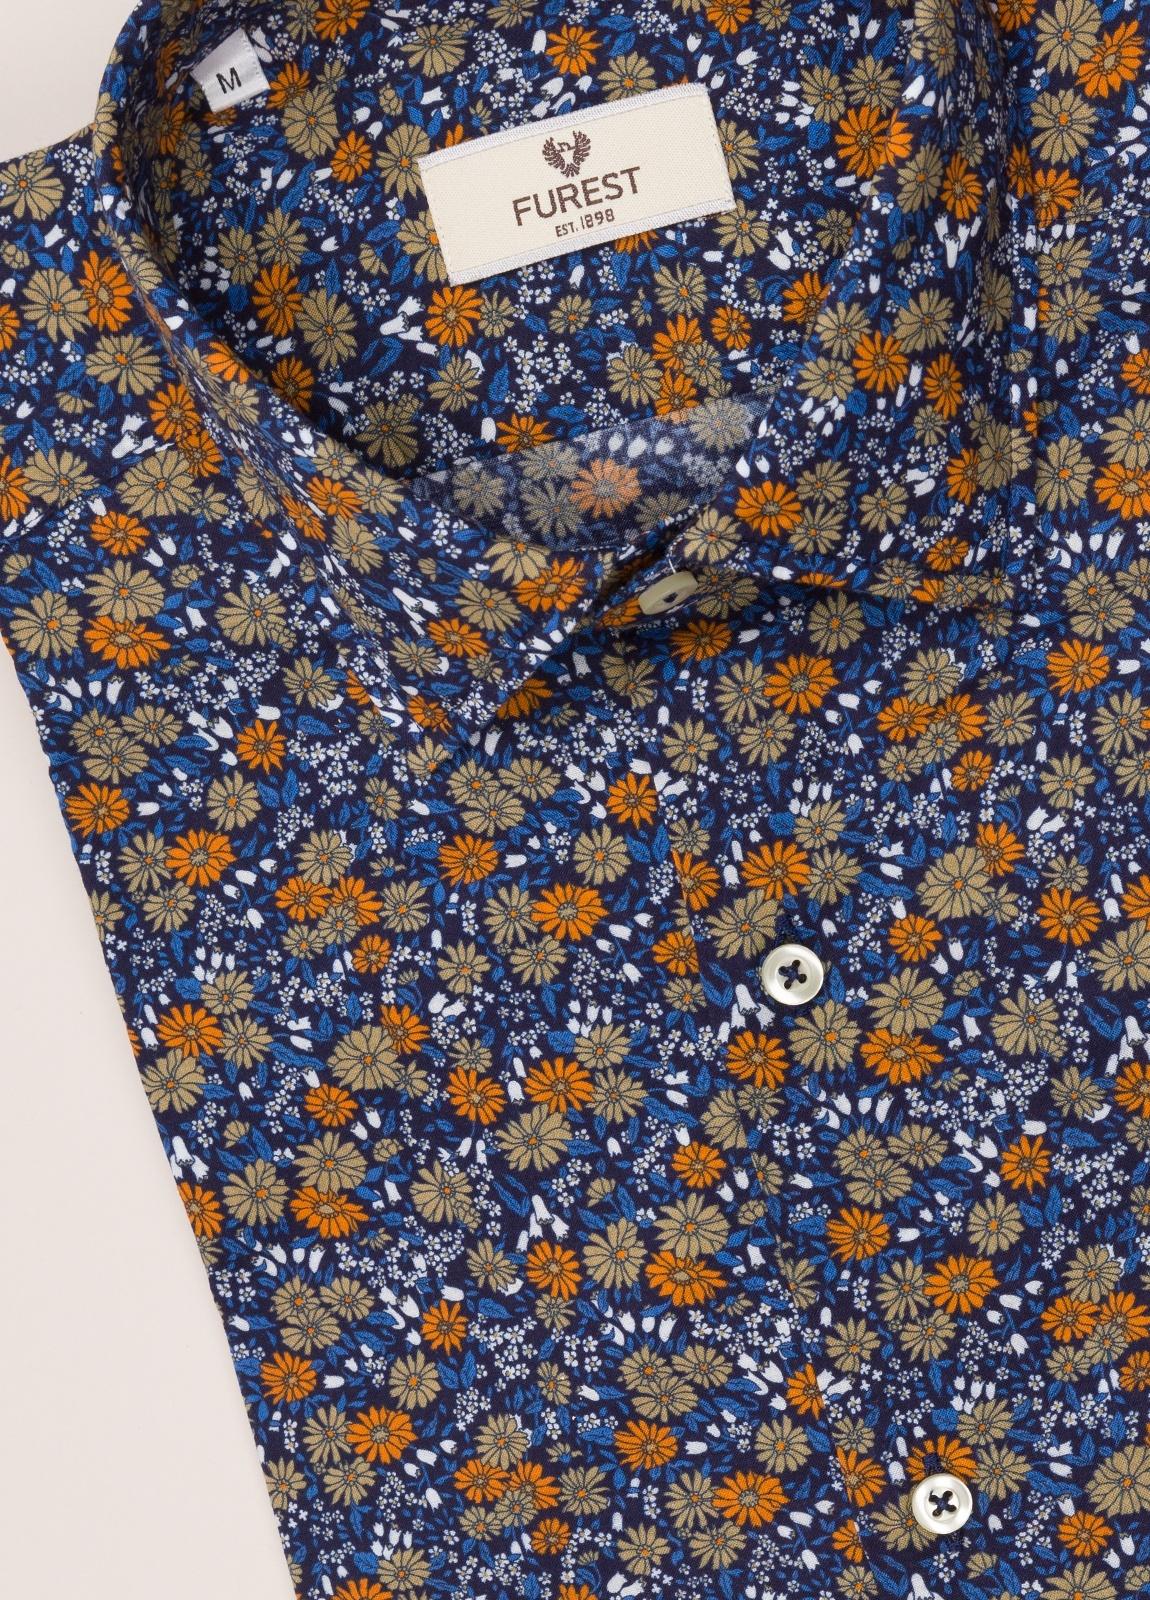 Camisa sport FUREST COLECCIÓN SLIM FIT flores azul - Ítem2